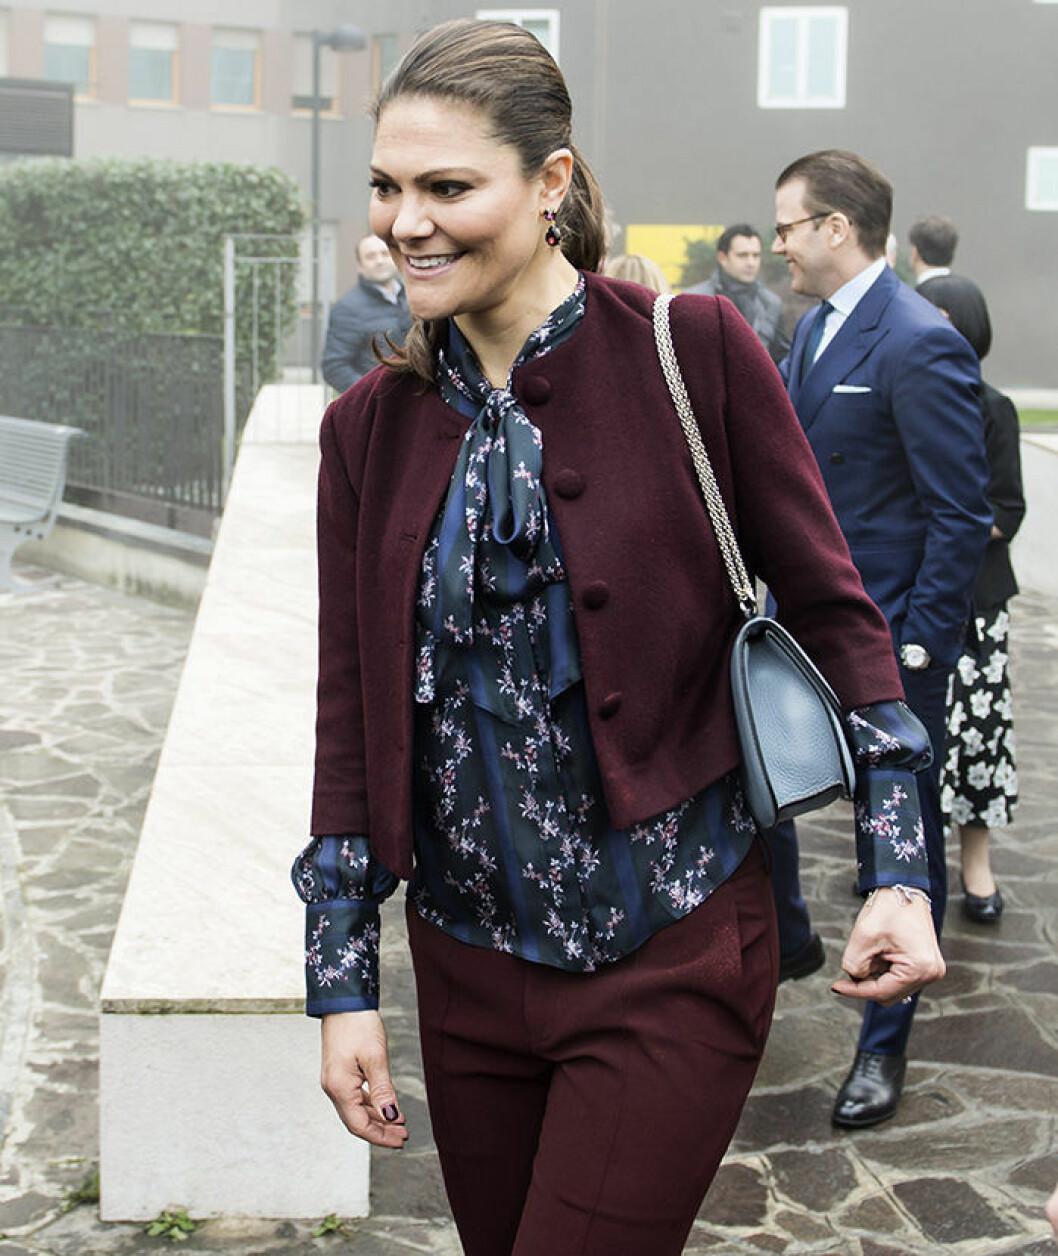 Crown Princess Victoria, Visit to hospital San Raffaele, Milan, Italy Swedish Royals visit to Milan, Italy 2016-12-17 (c) Carolina Byrmo / IBL BildbyrKronprinsessparets resa till Milano, Italien - besˆk pforskningssjukhuset San Raffaele